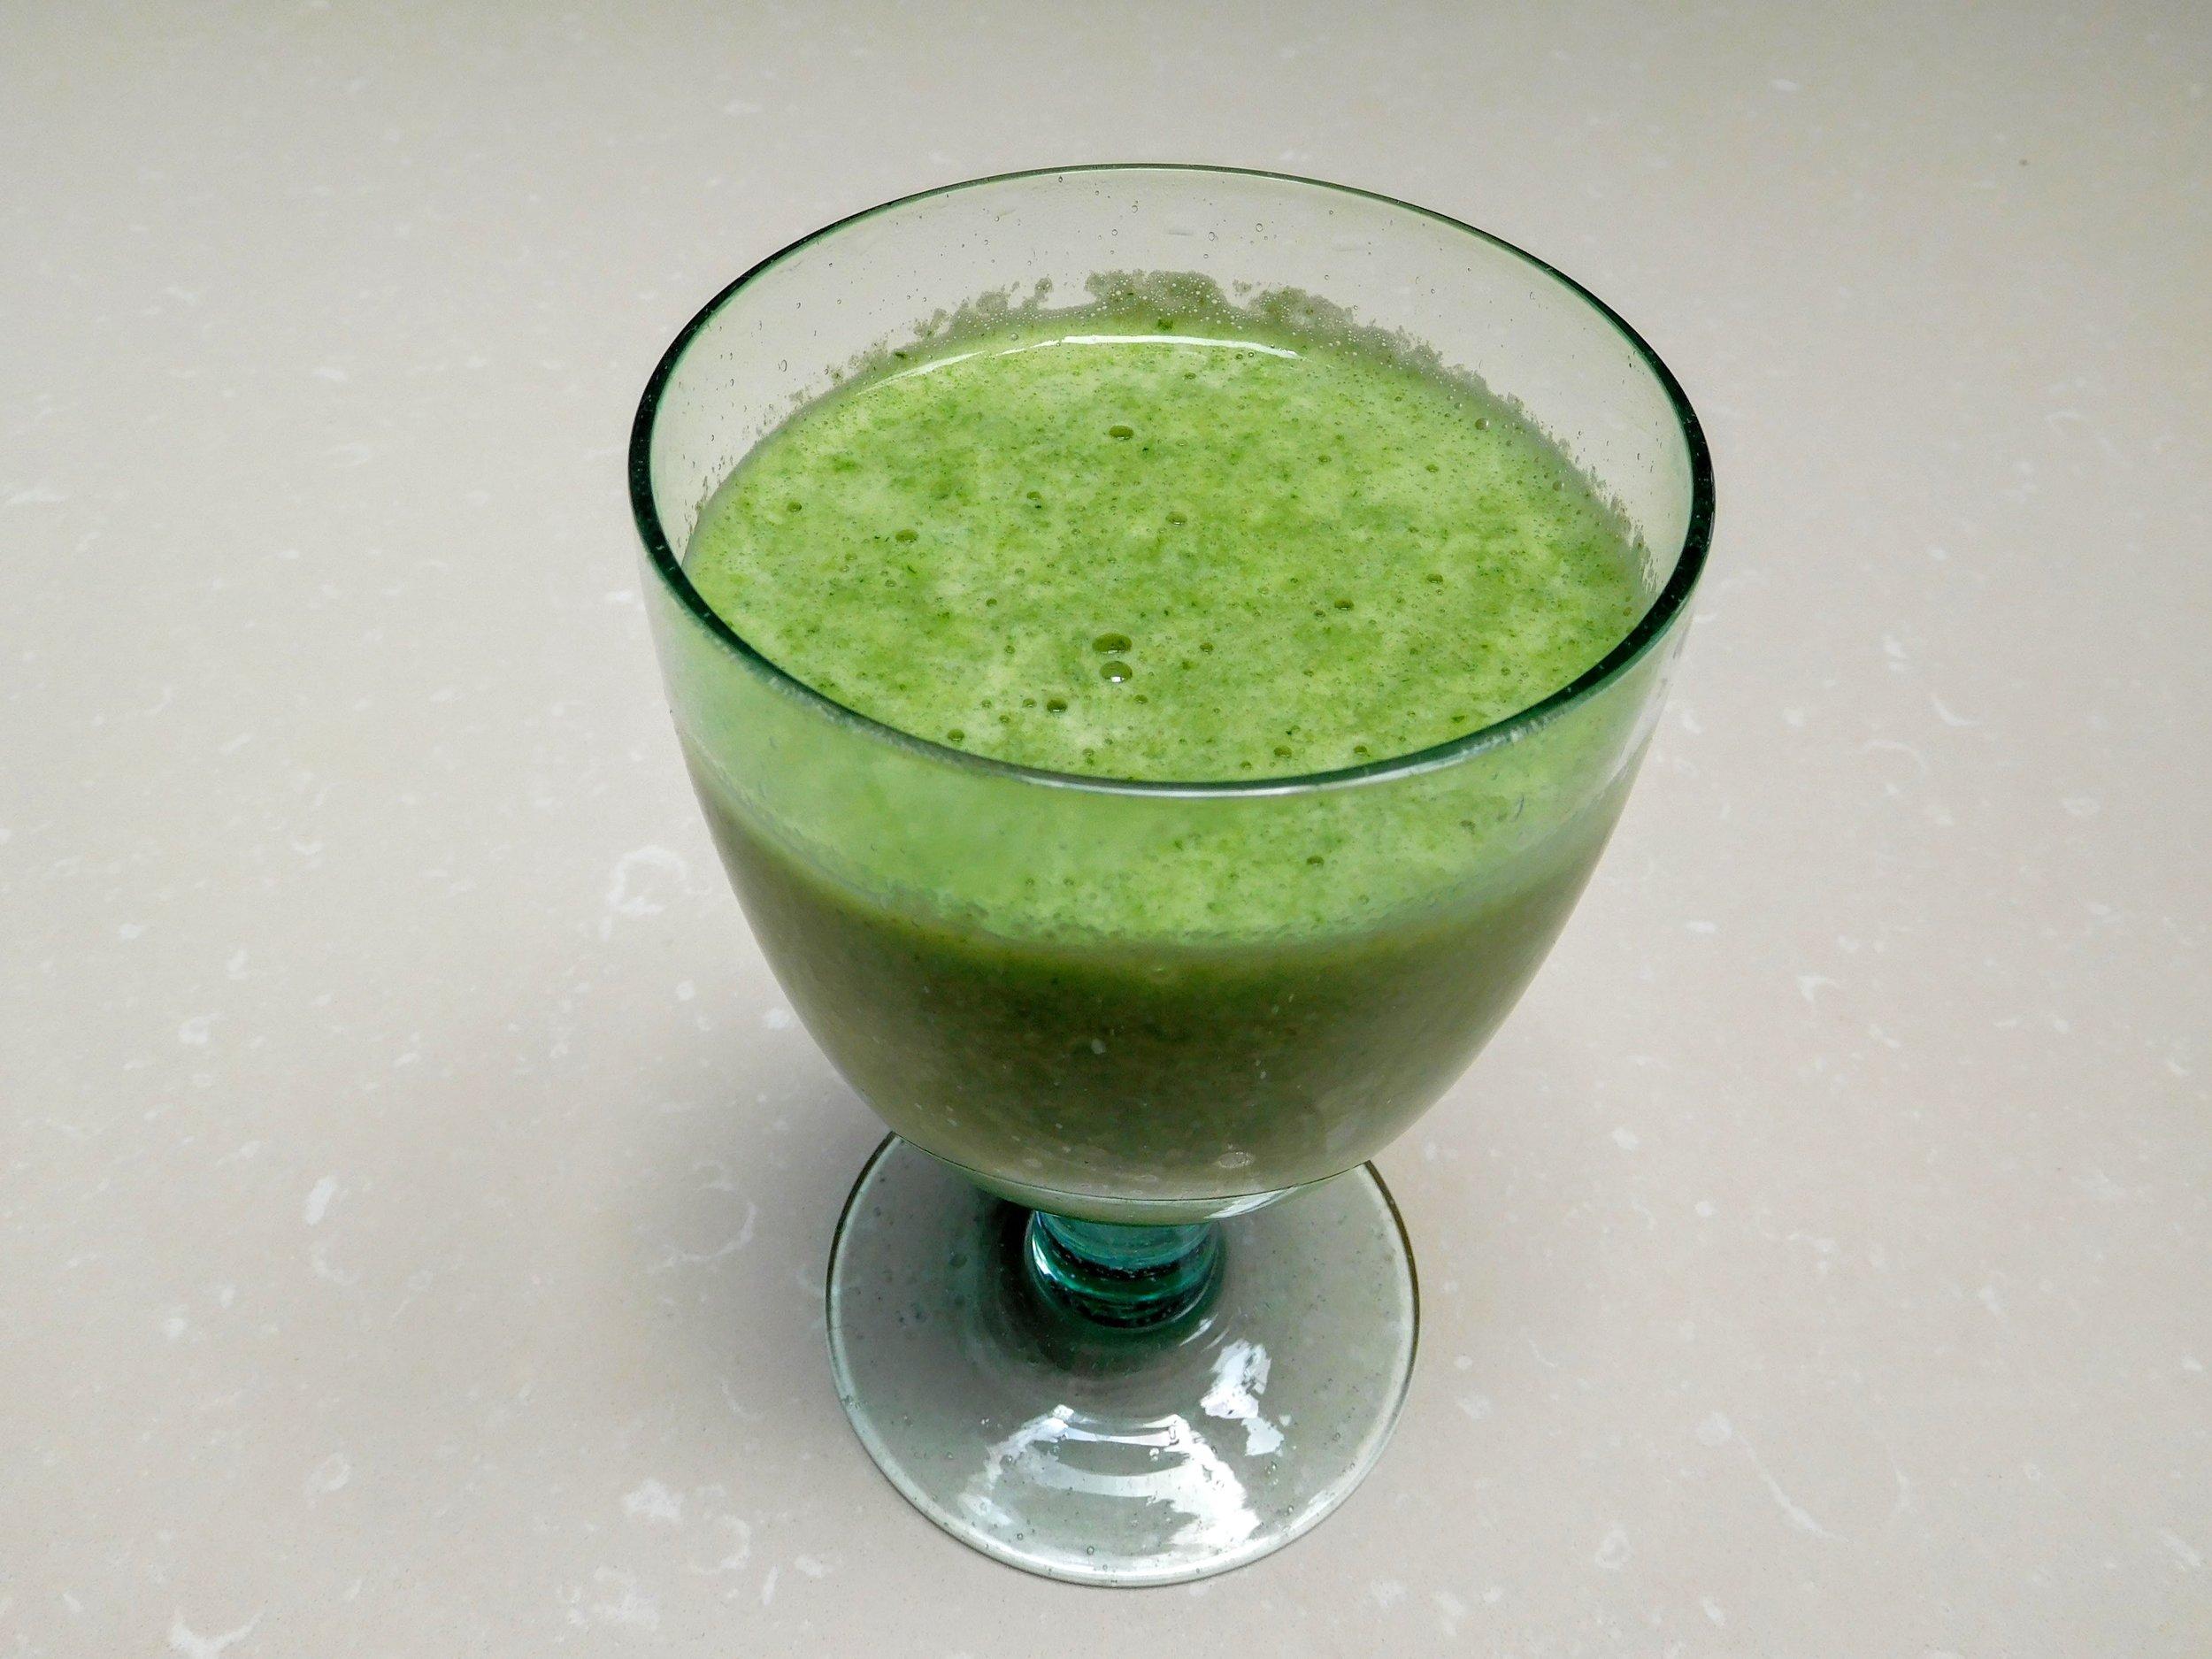 Green Citrus Smoothie